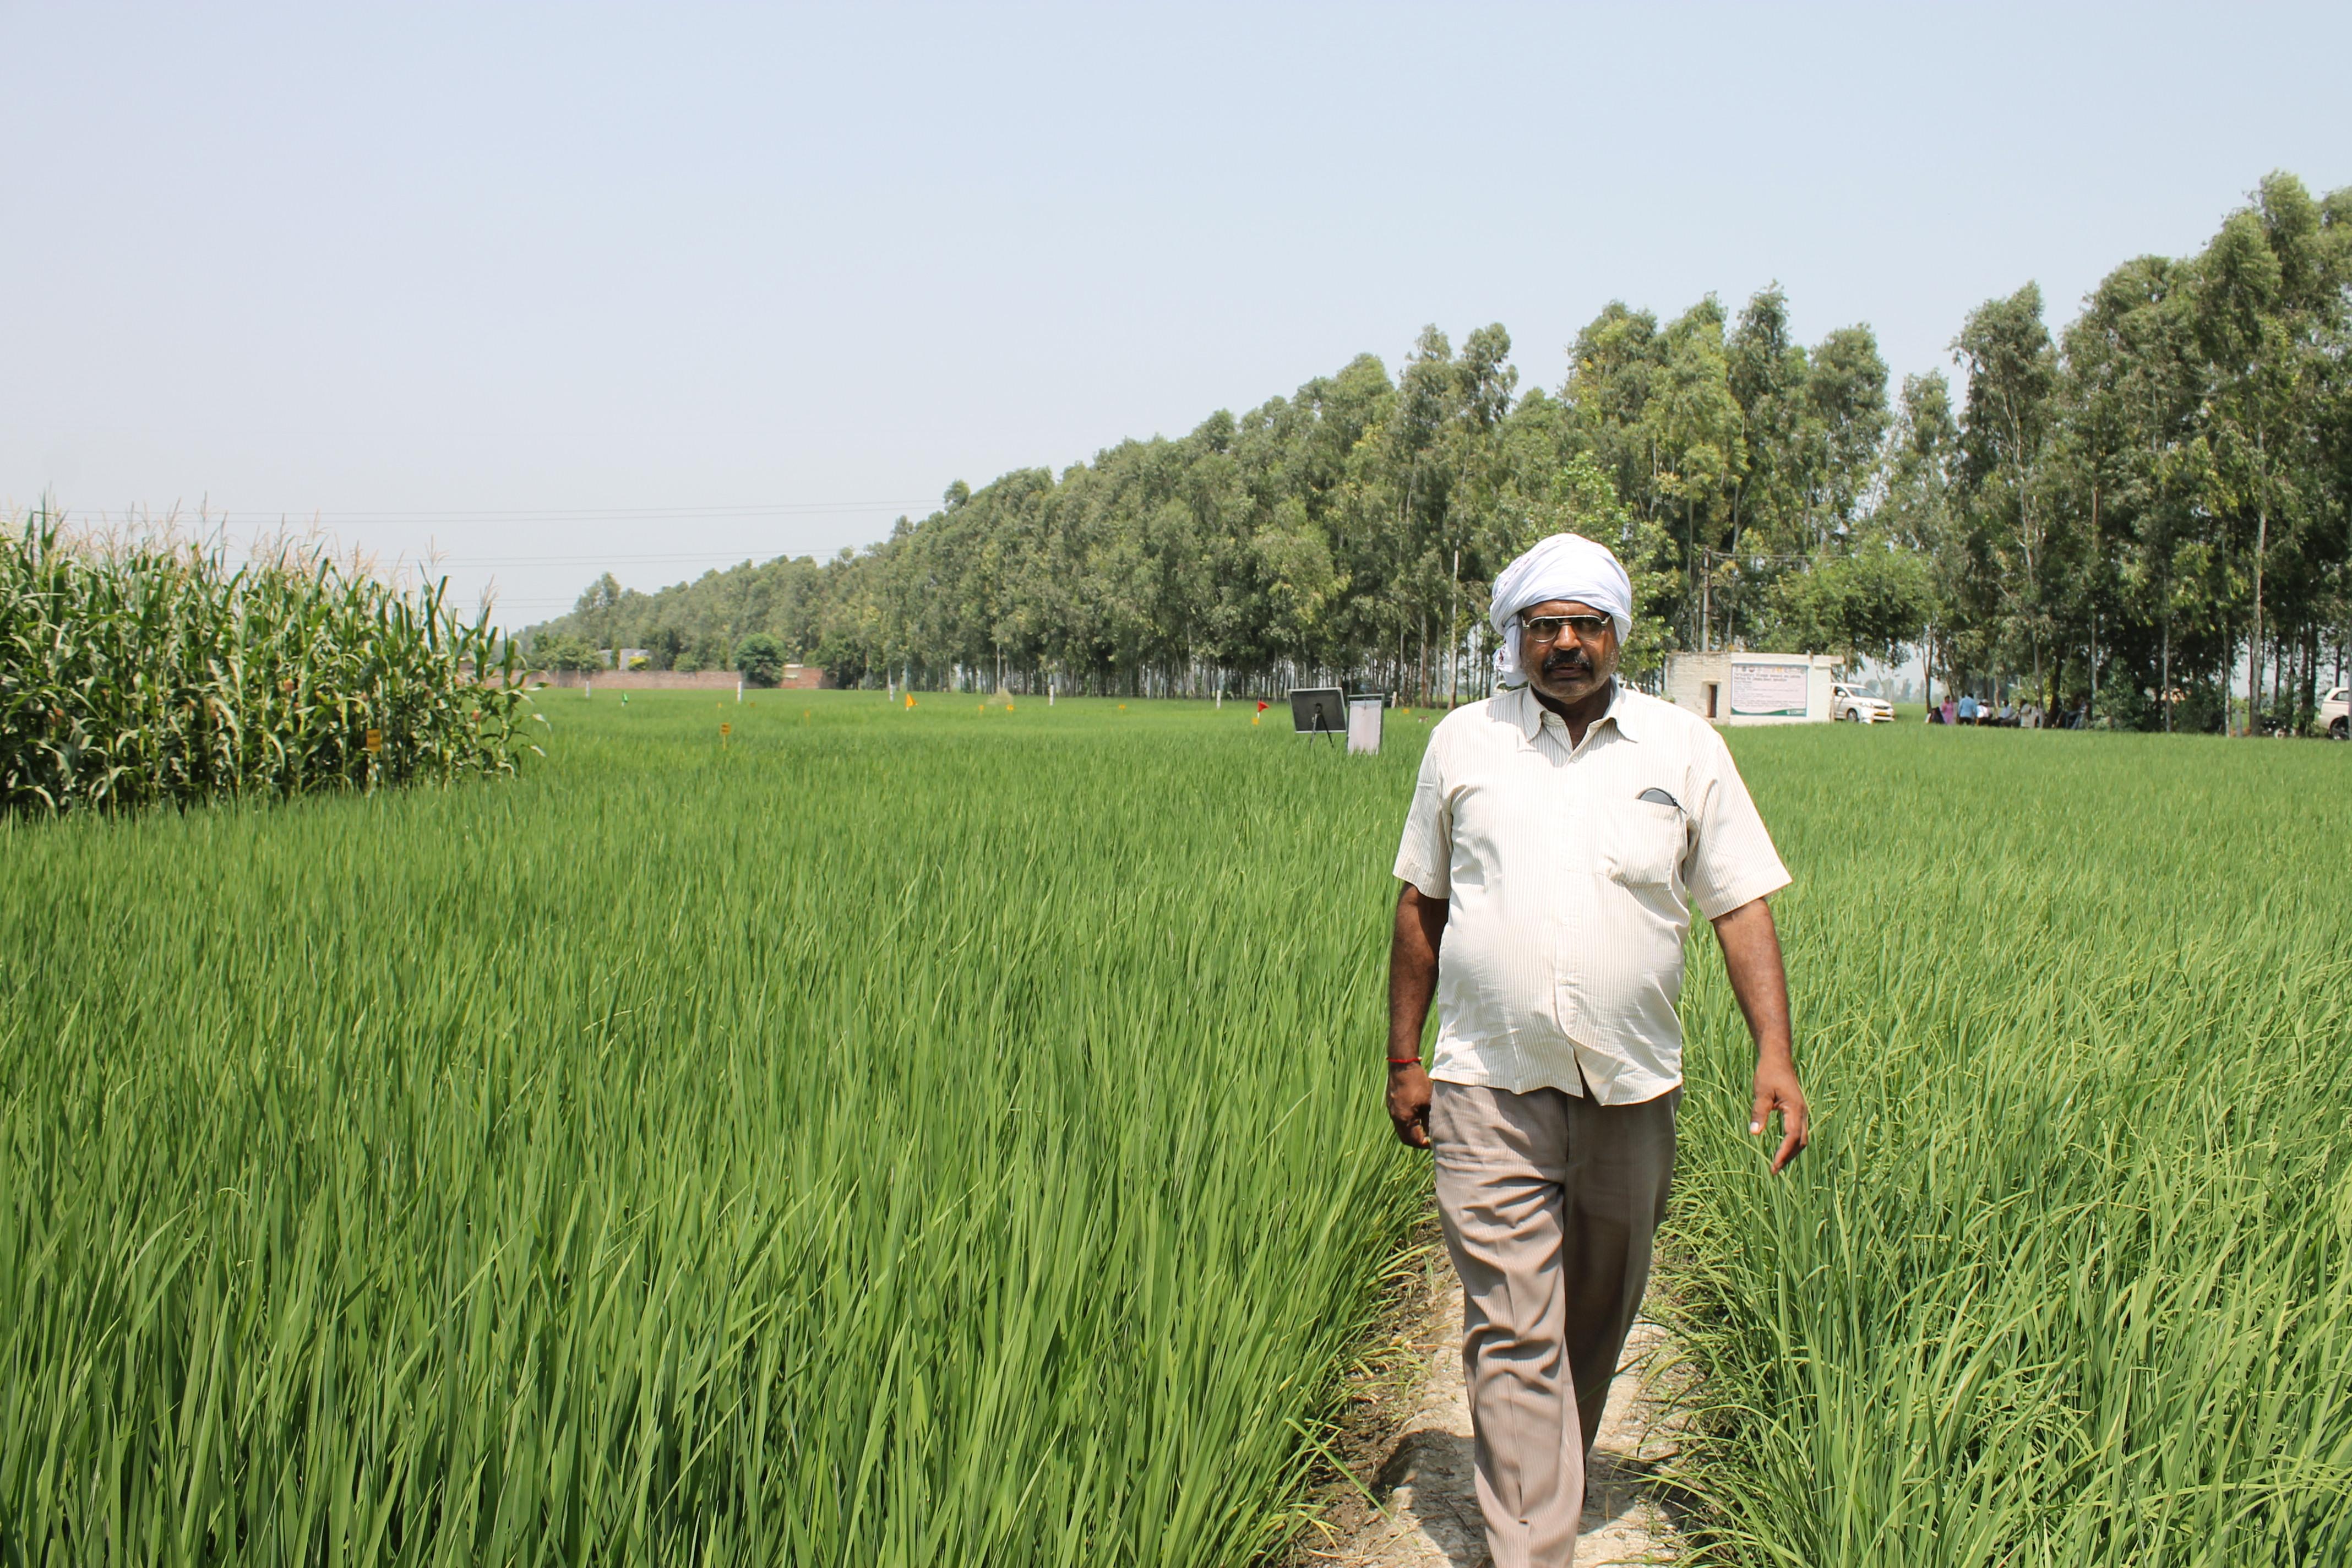 A farmer walks through his rice field in Taraori village in Karnal, Haryana, India. CIMMYT/M.L. Jat